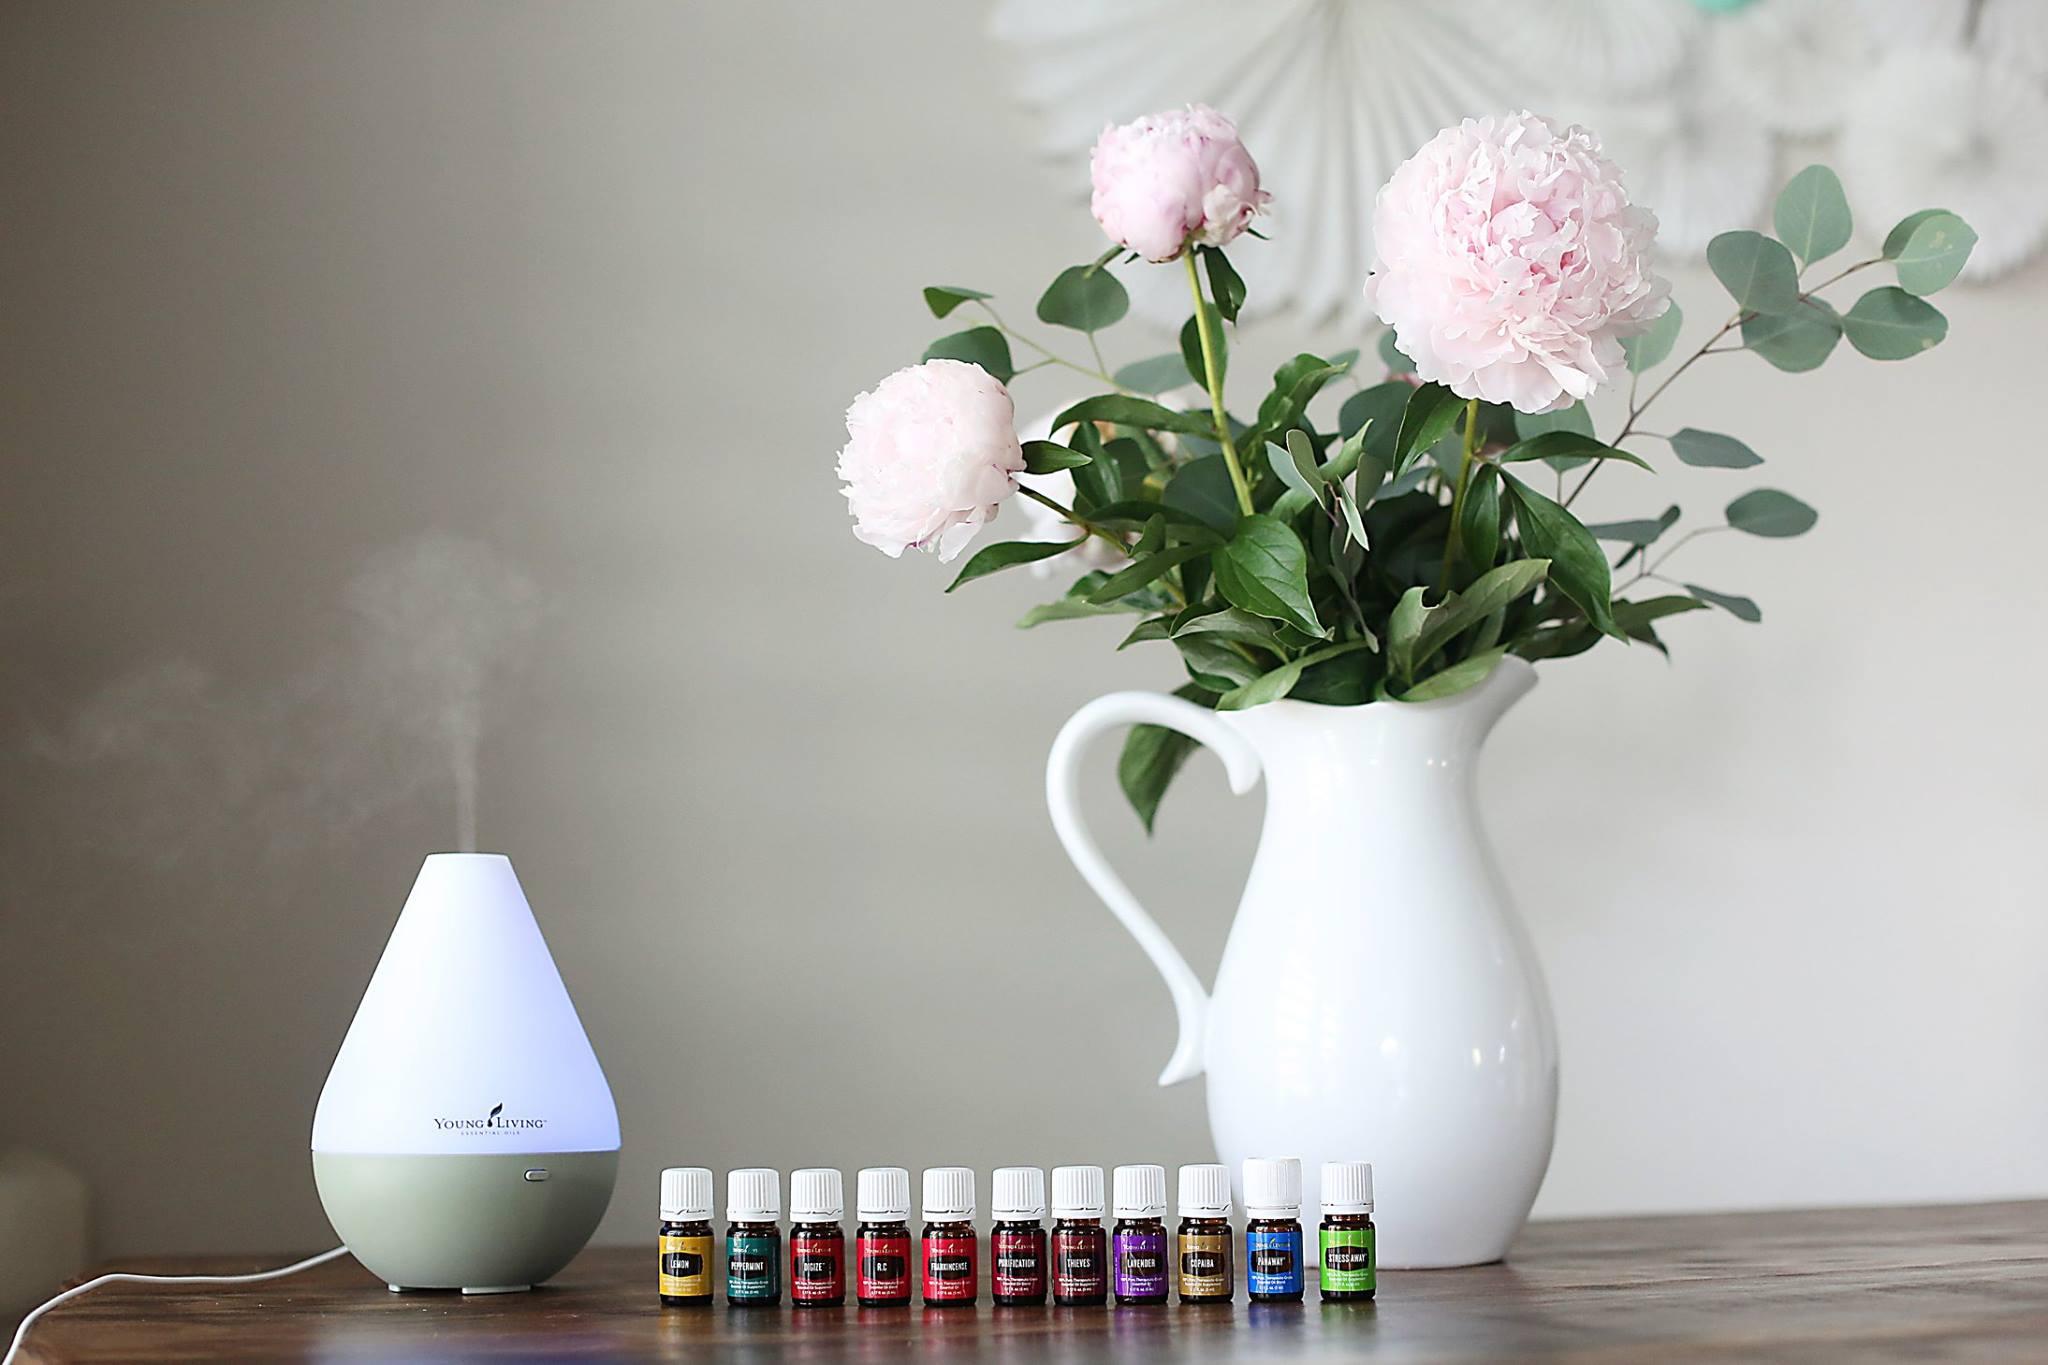 kit-oils-dewdrop-diffuser-pink-flowers-in-white-vase.jpg